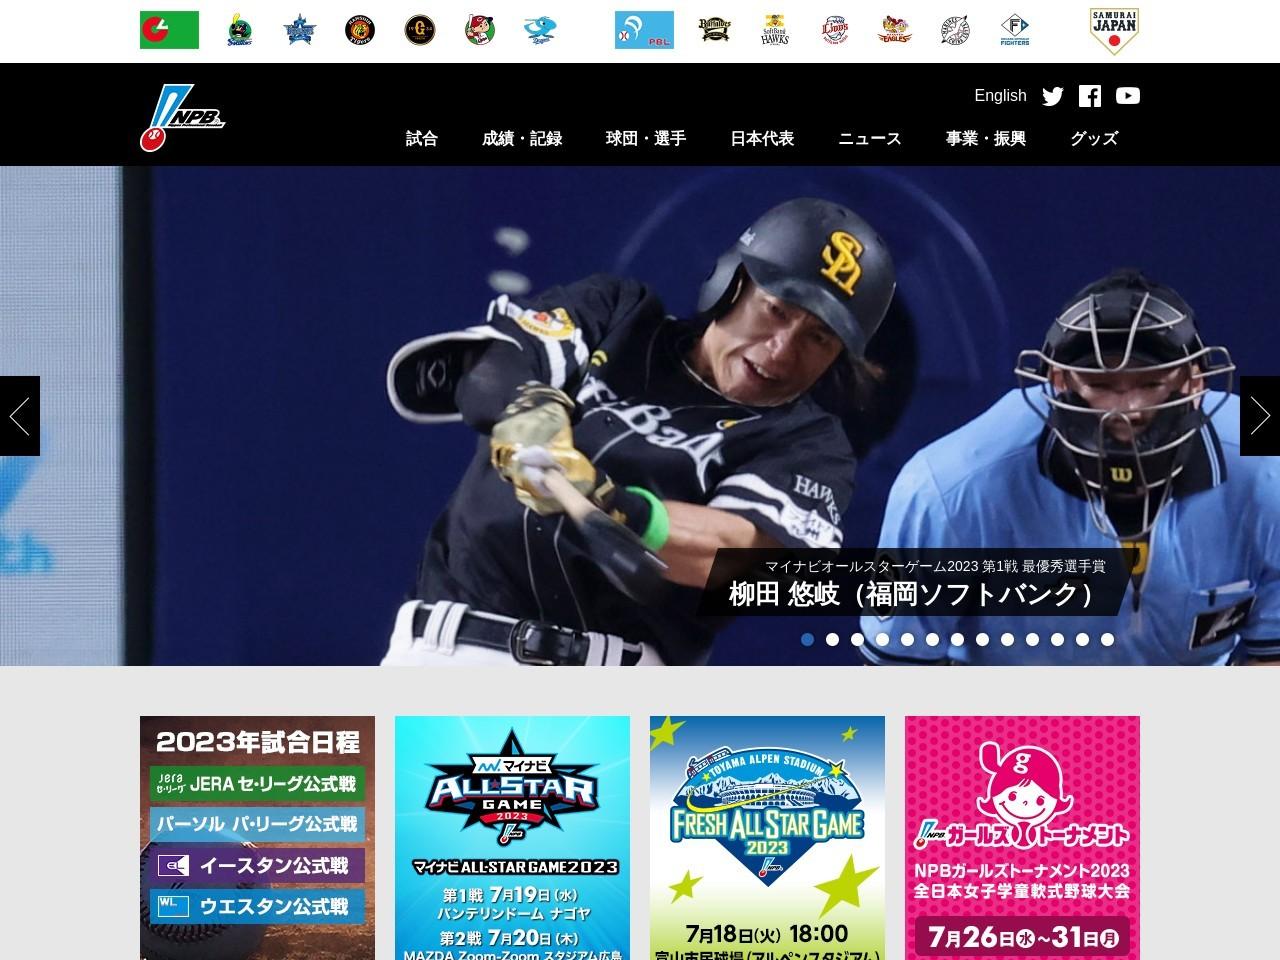 出場選手登録および登録抹消 | 公示 | NPB.jp 日本野球機構